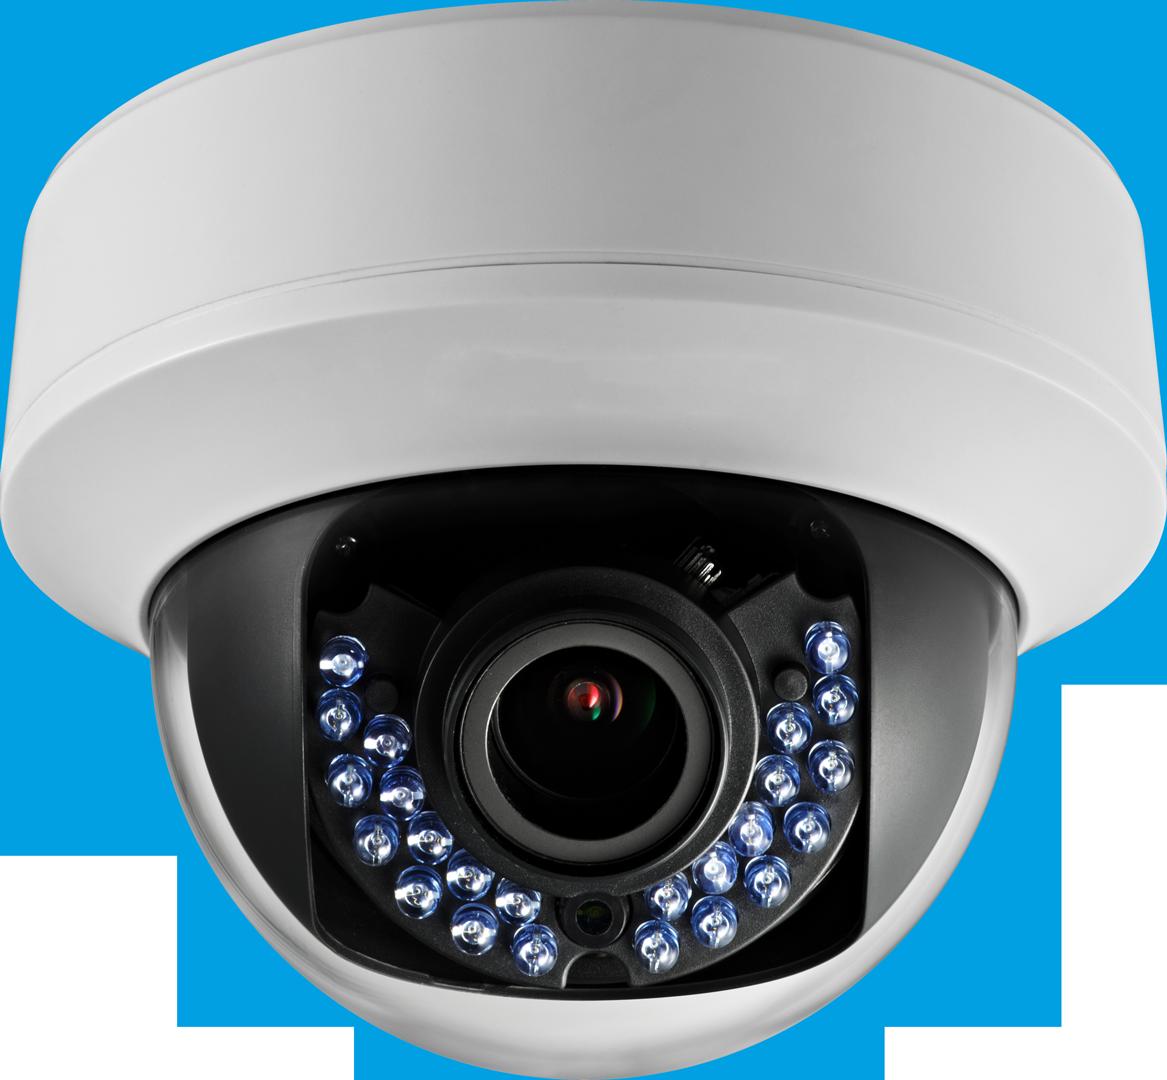 CCTV Products| INFINIZE CORPTECH PVT LTD